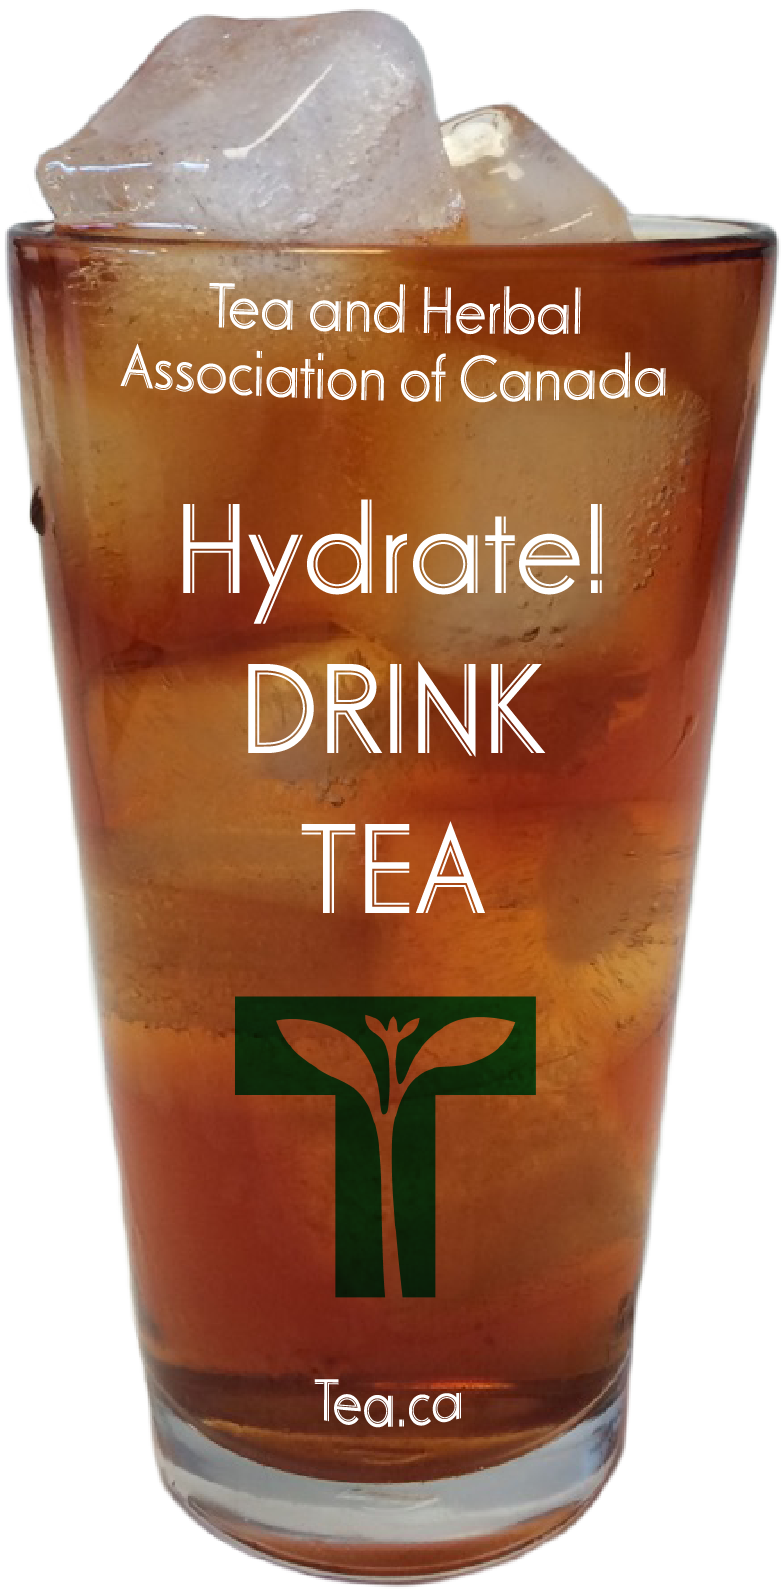 Hydrate! Drink Tea!